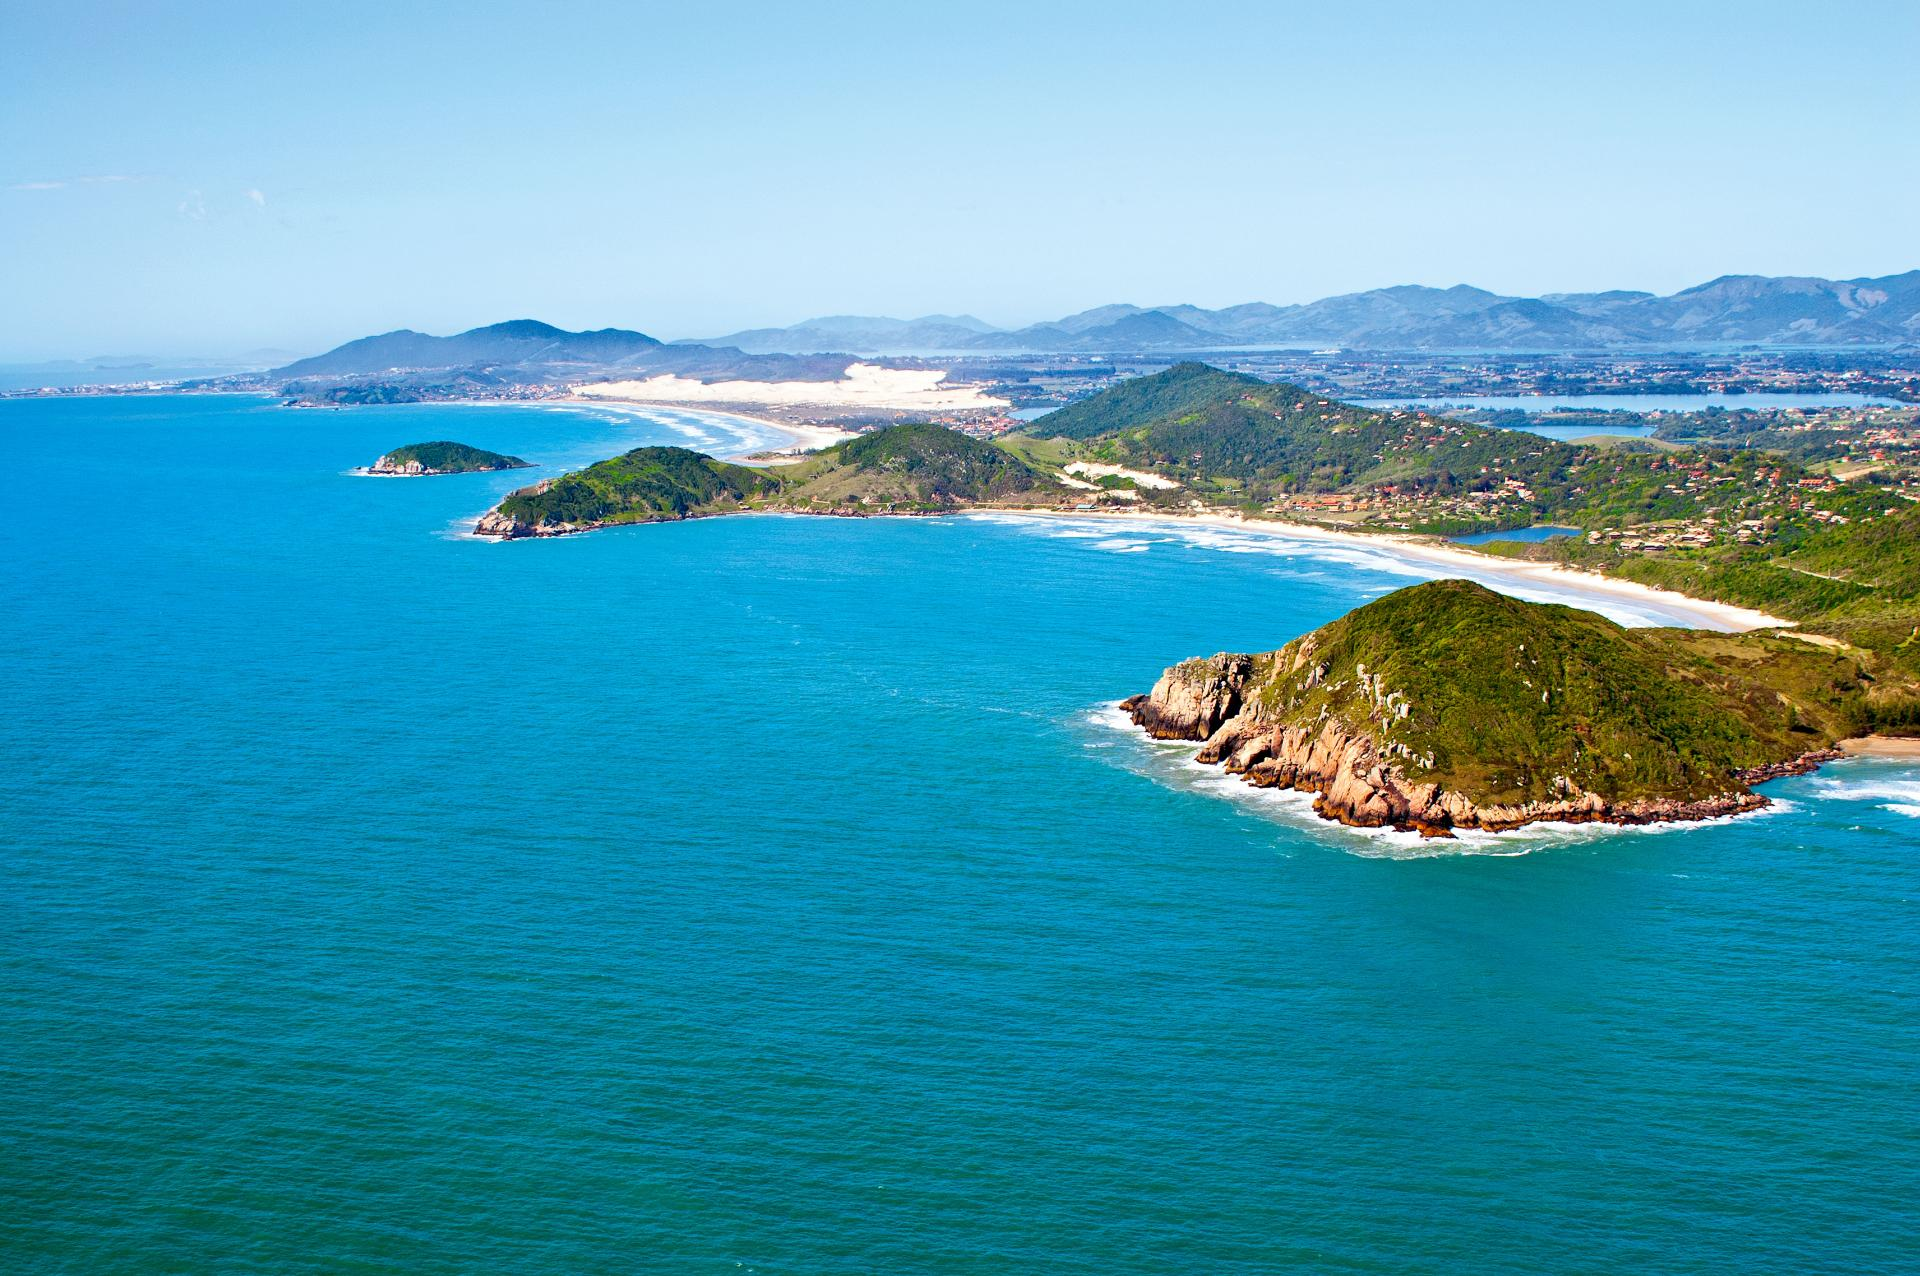 Panorama Praia do Rosa und Umgebung